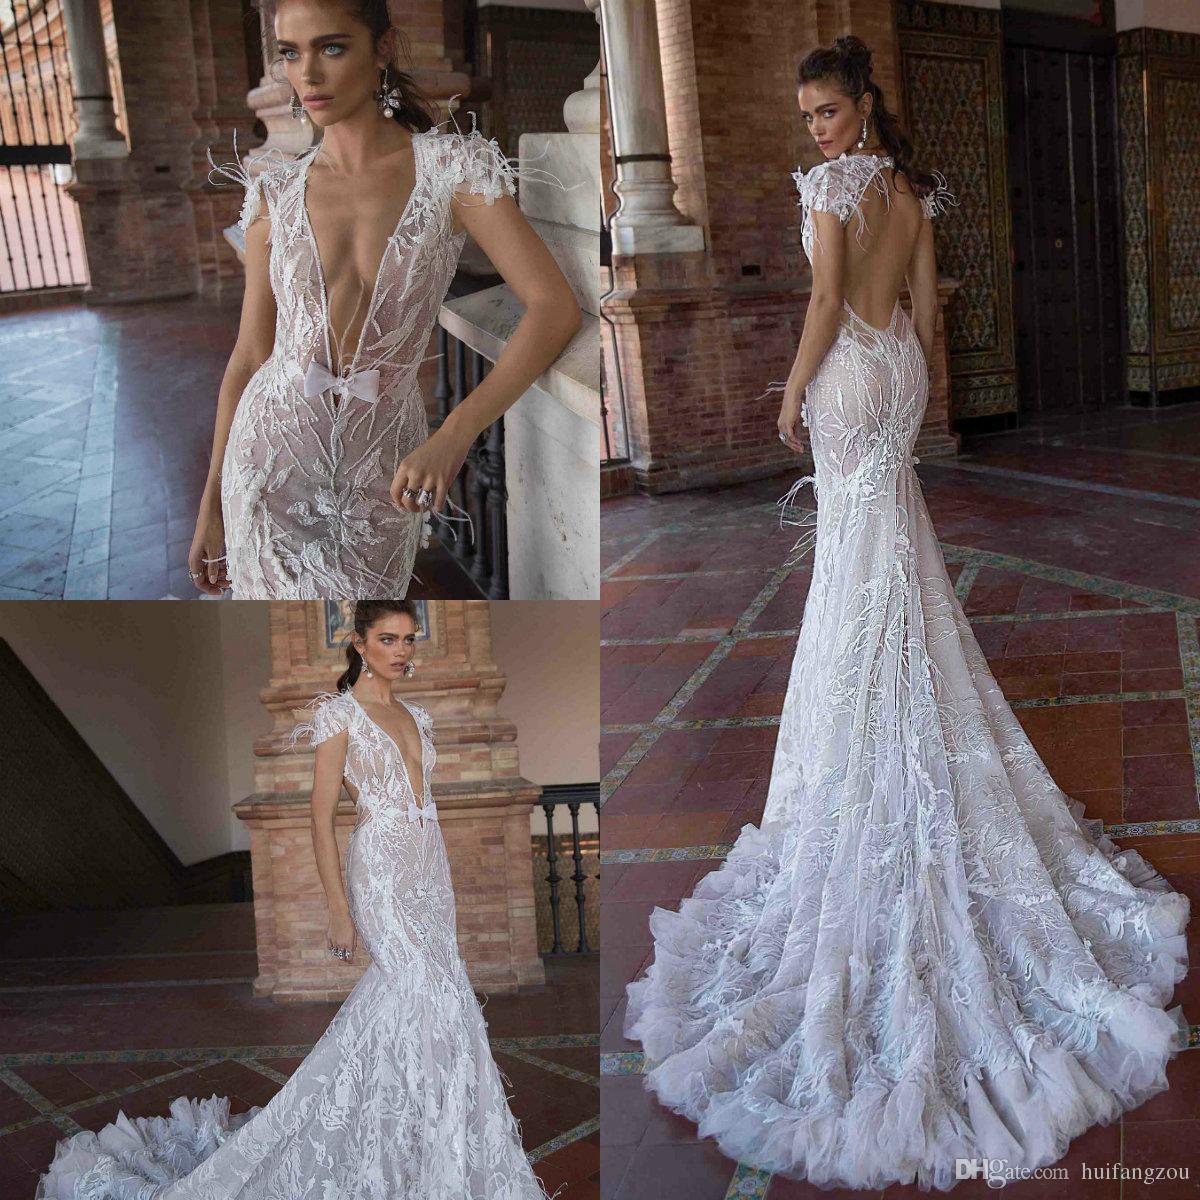 Dhgate Com Wedding Gowns: Berta Fashion 2019 Wedding Dresses Sexy Deep V Neck Cap